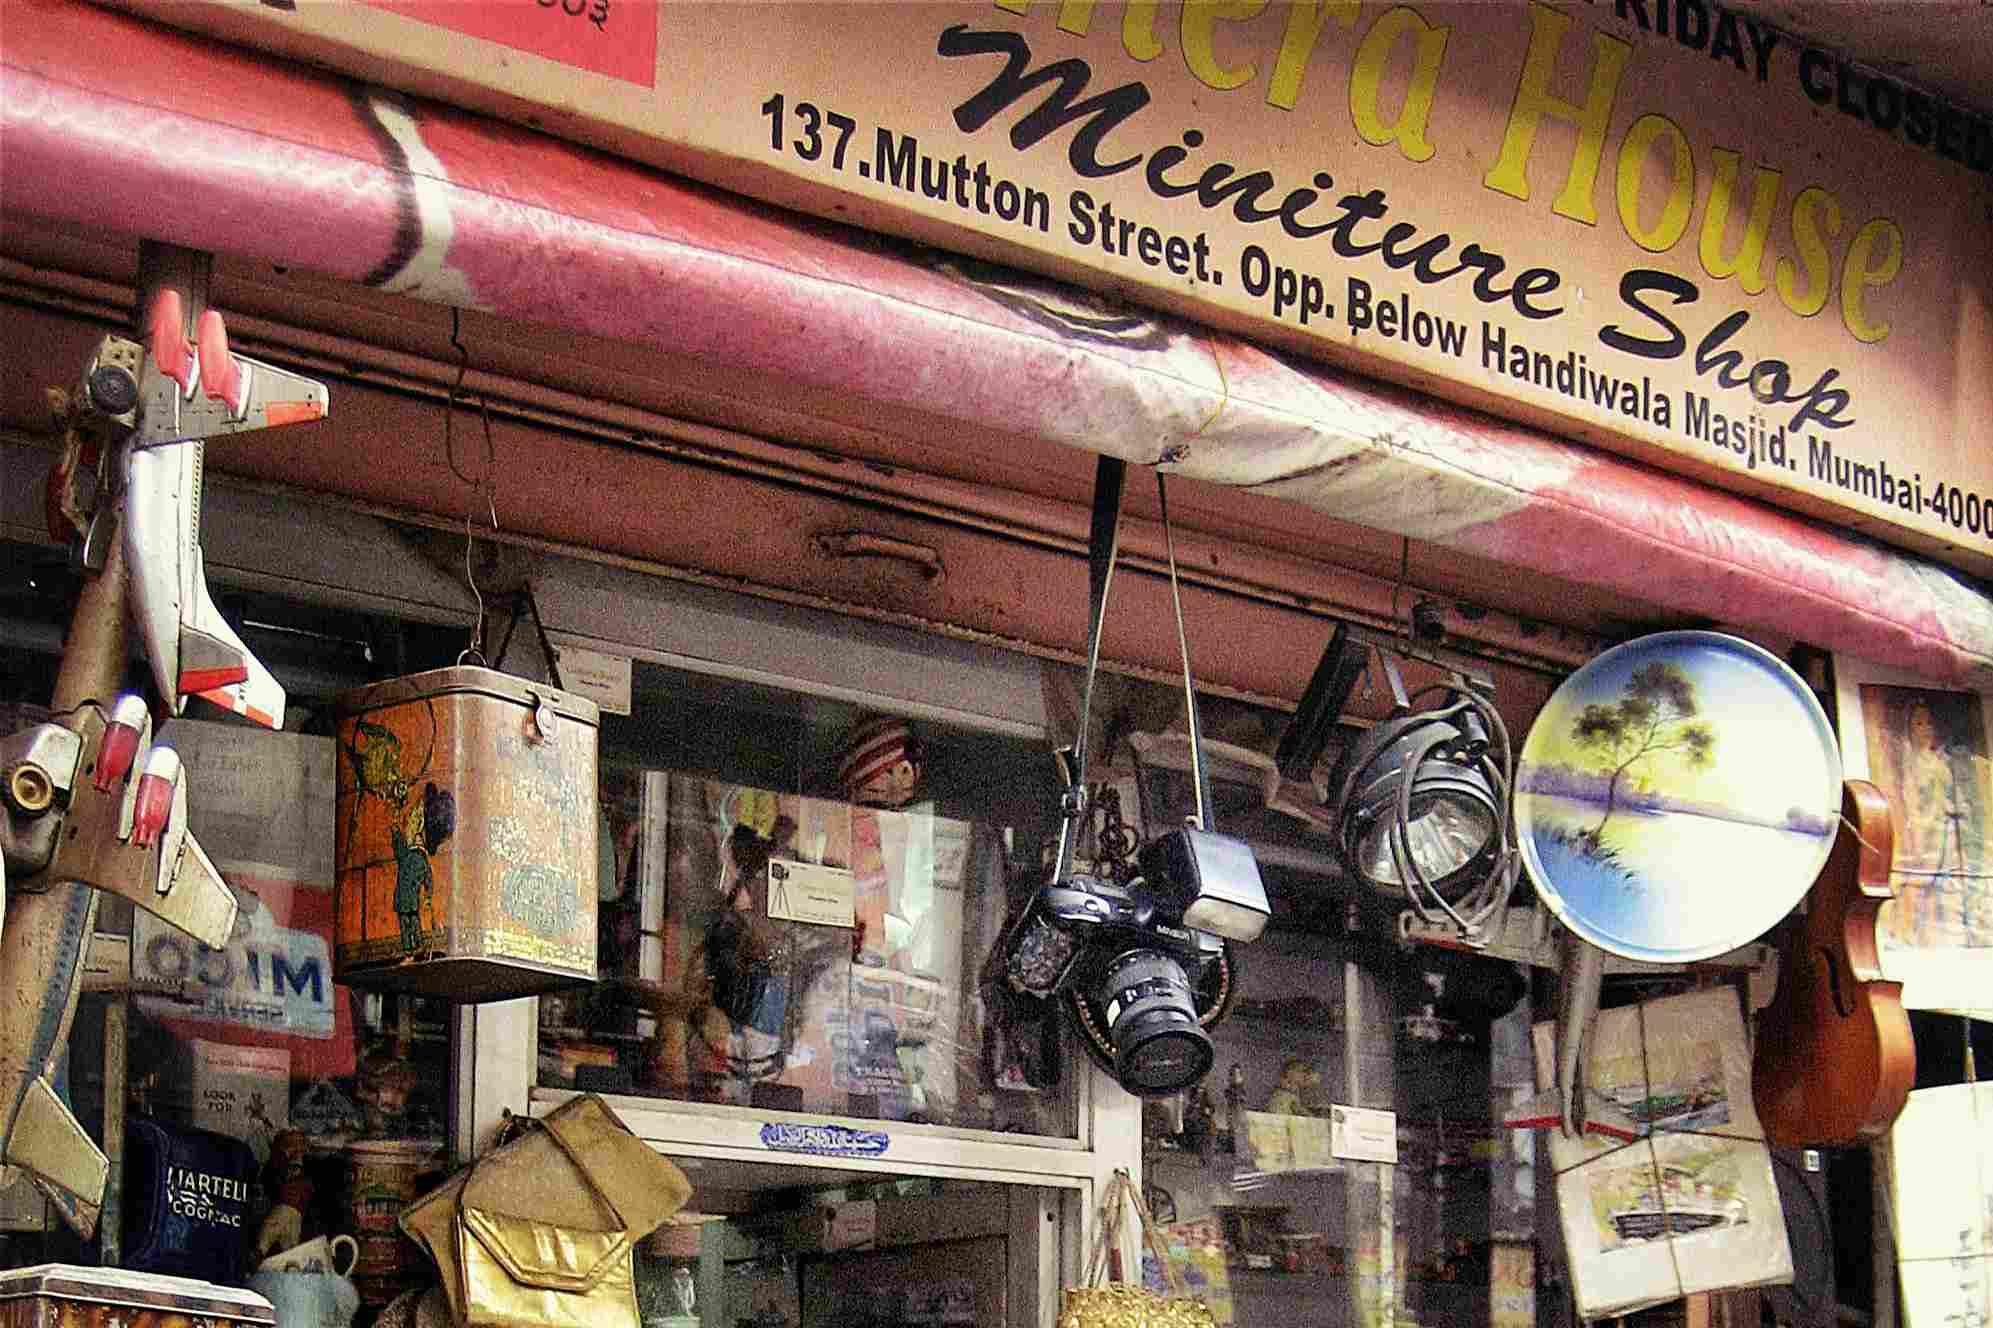 Camera House and Miniature Shop, 137 Mutton Street, Mumbai.